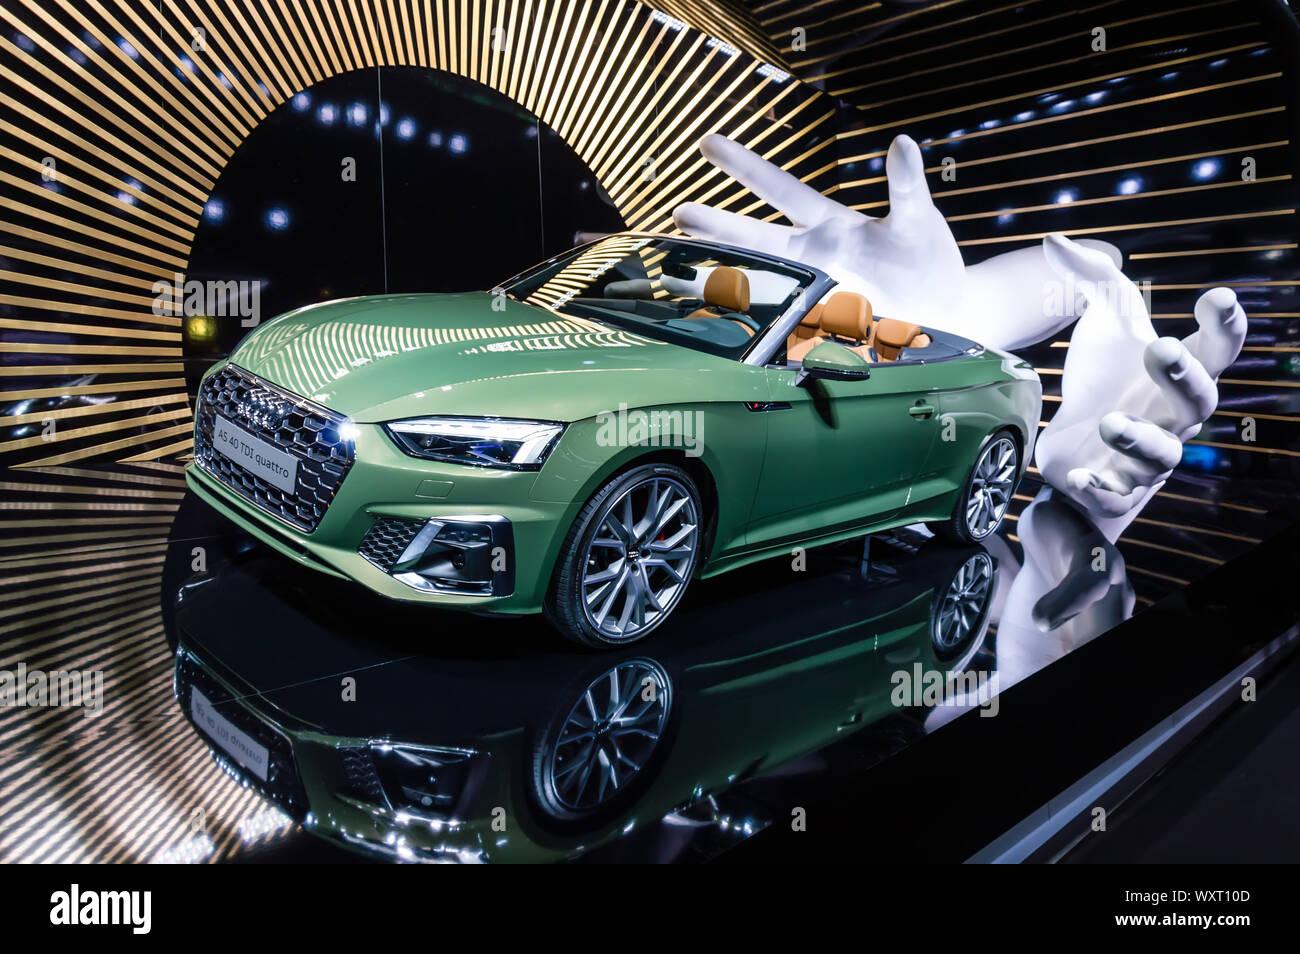 Frankfurt Sep 15 2019 New Audi A5 40 Tdi Quattro Cabriolet Car In Green Metallic Facelift For Luxury Cabrio Presented At Iaa 2019 Frankfurt Moto Stock Photo Alamy